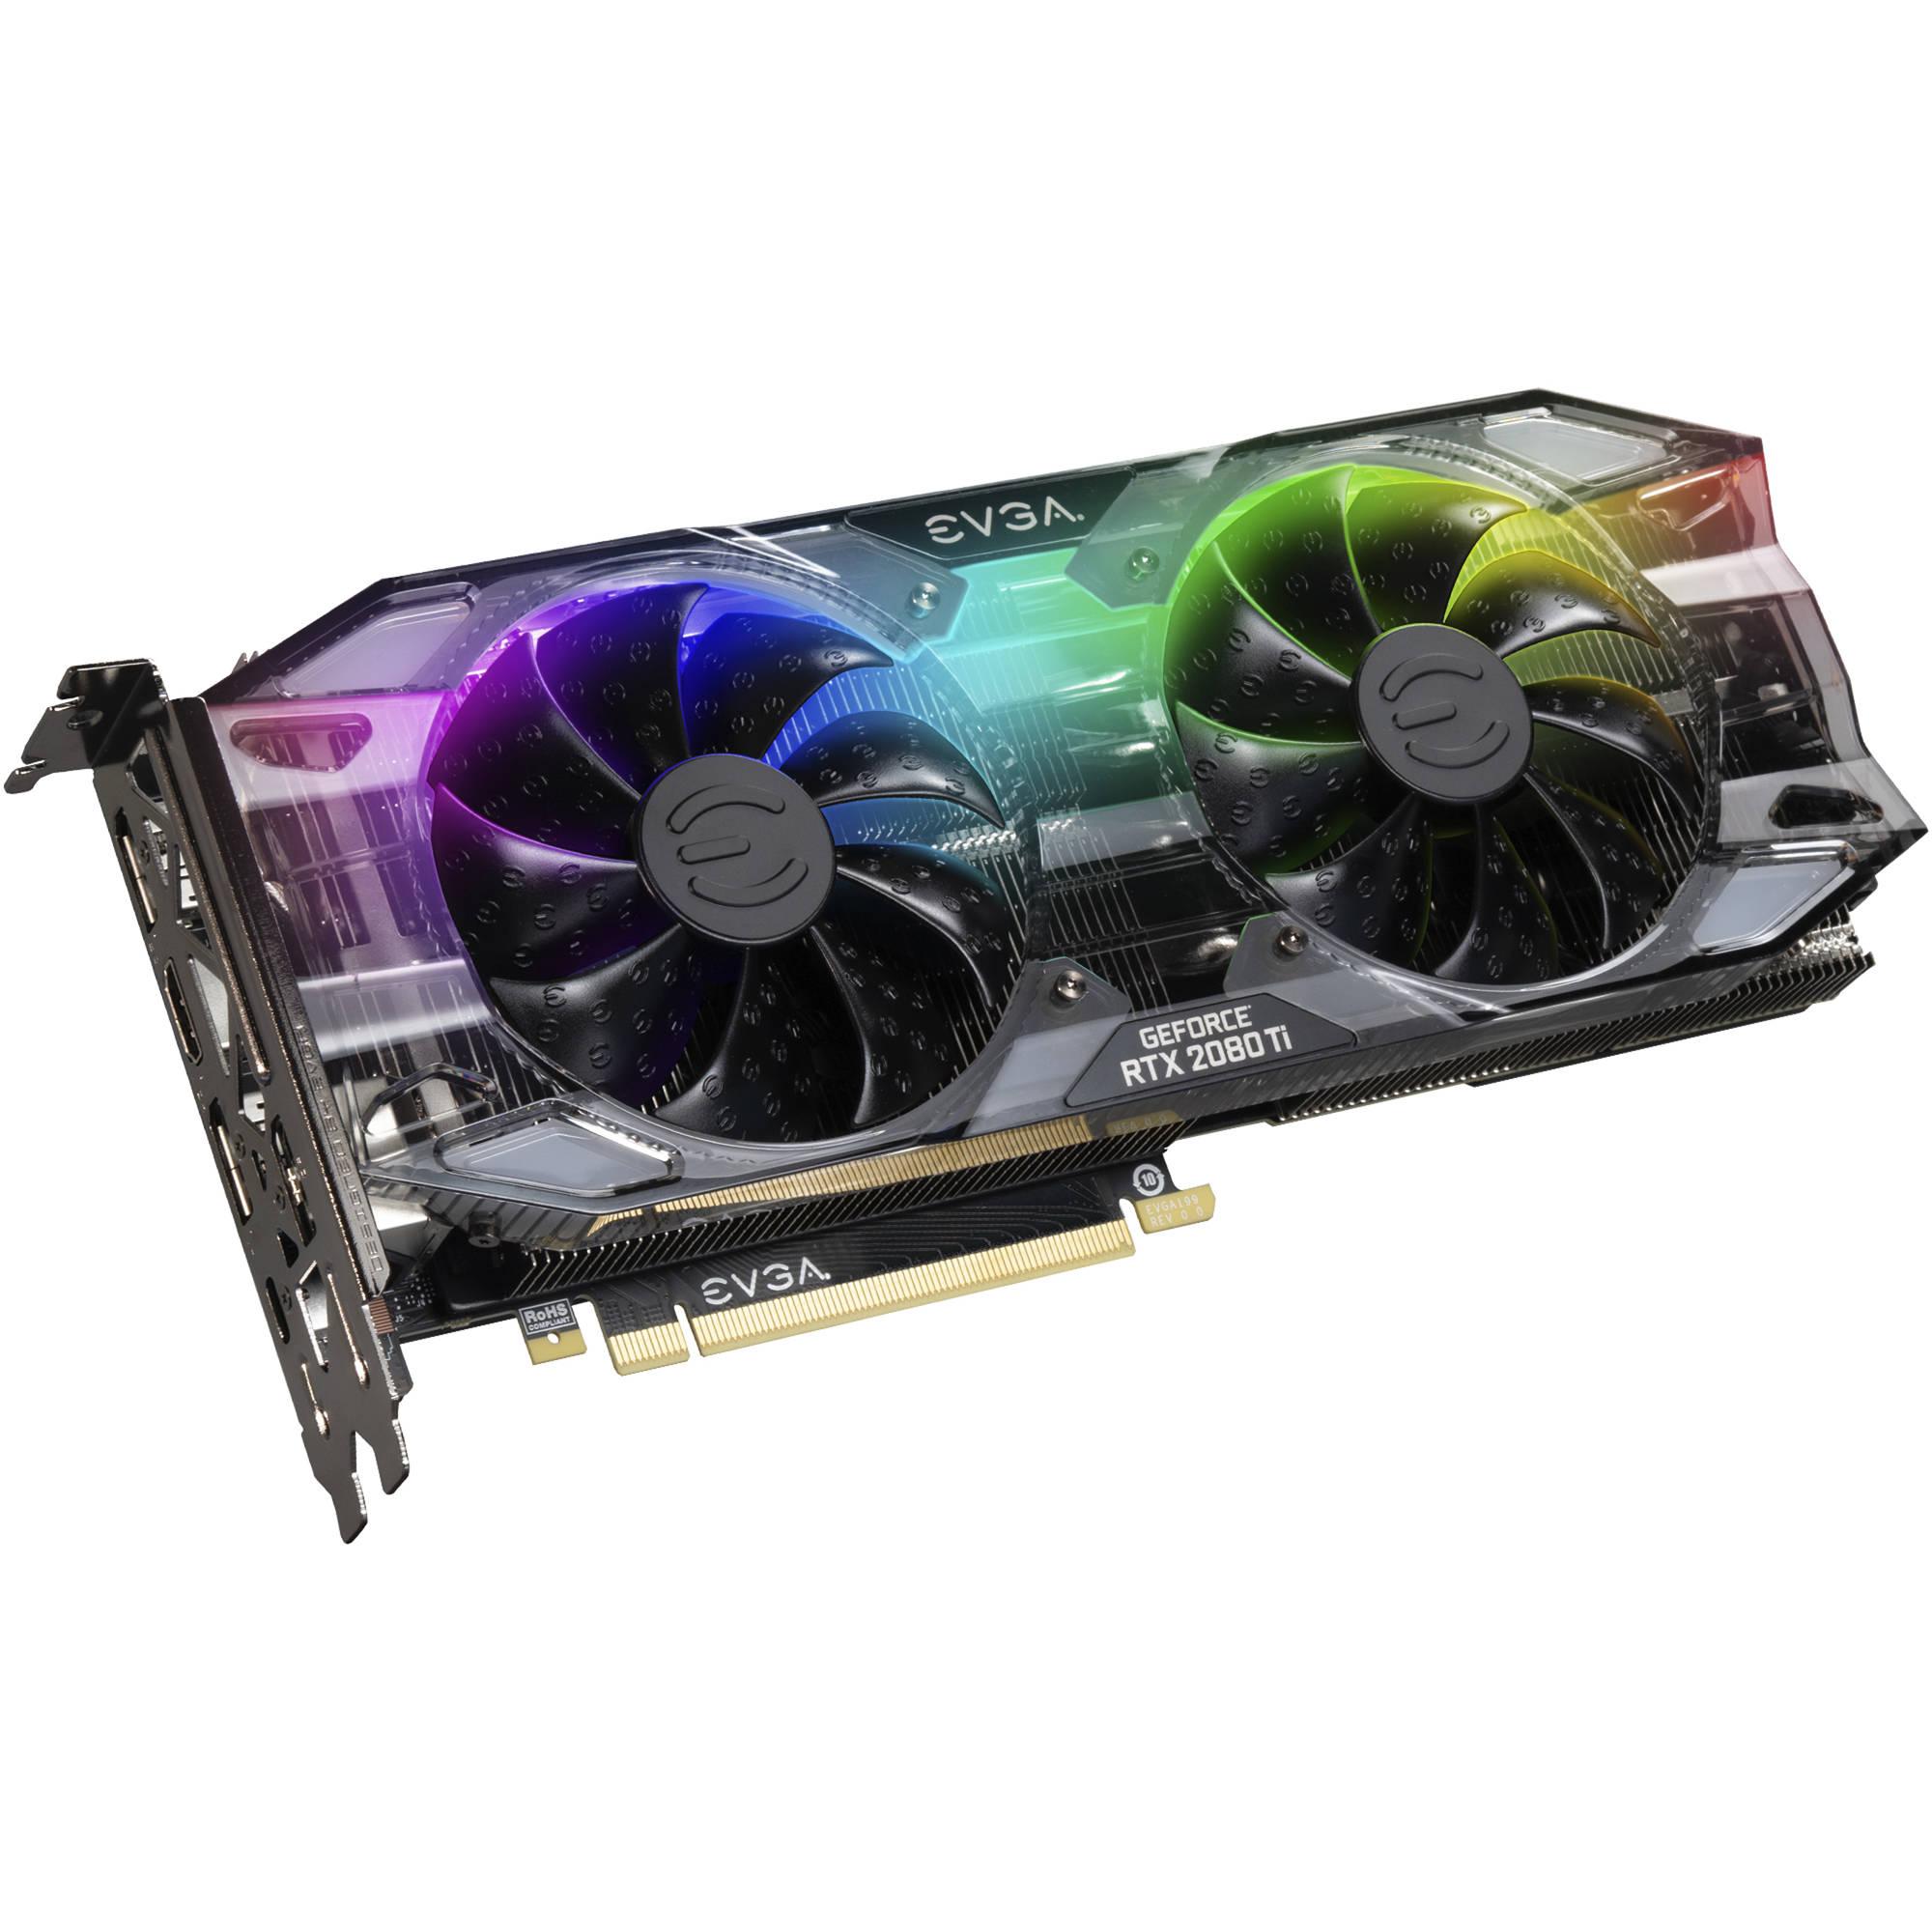 EVGA GeForce RTX 2080 Ti XC GAMING Graphics Card